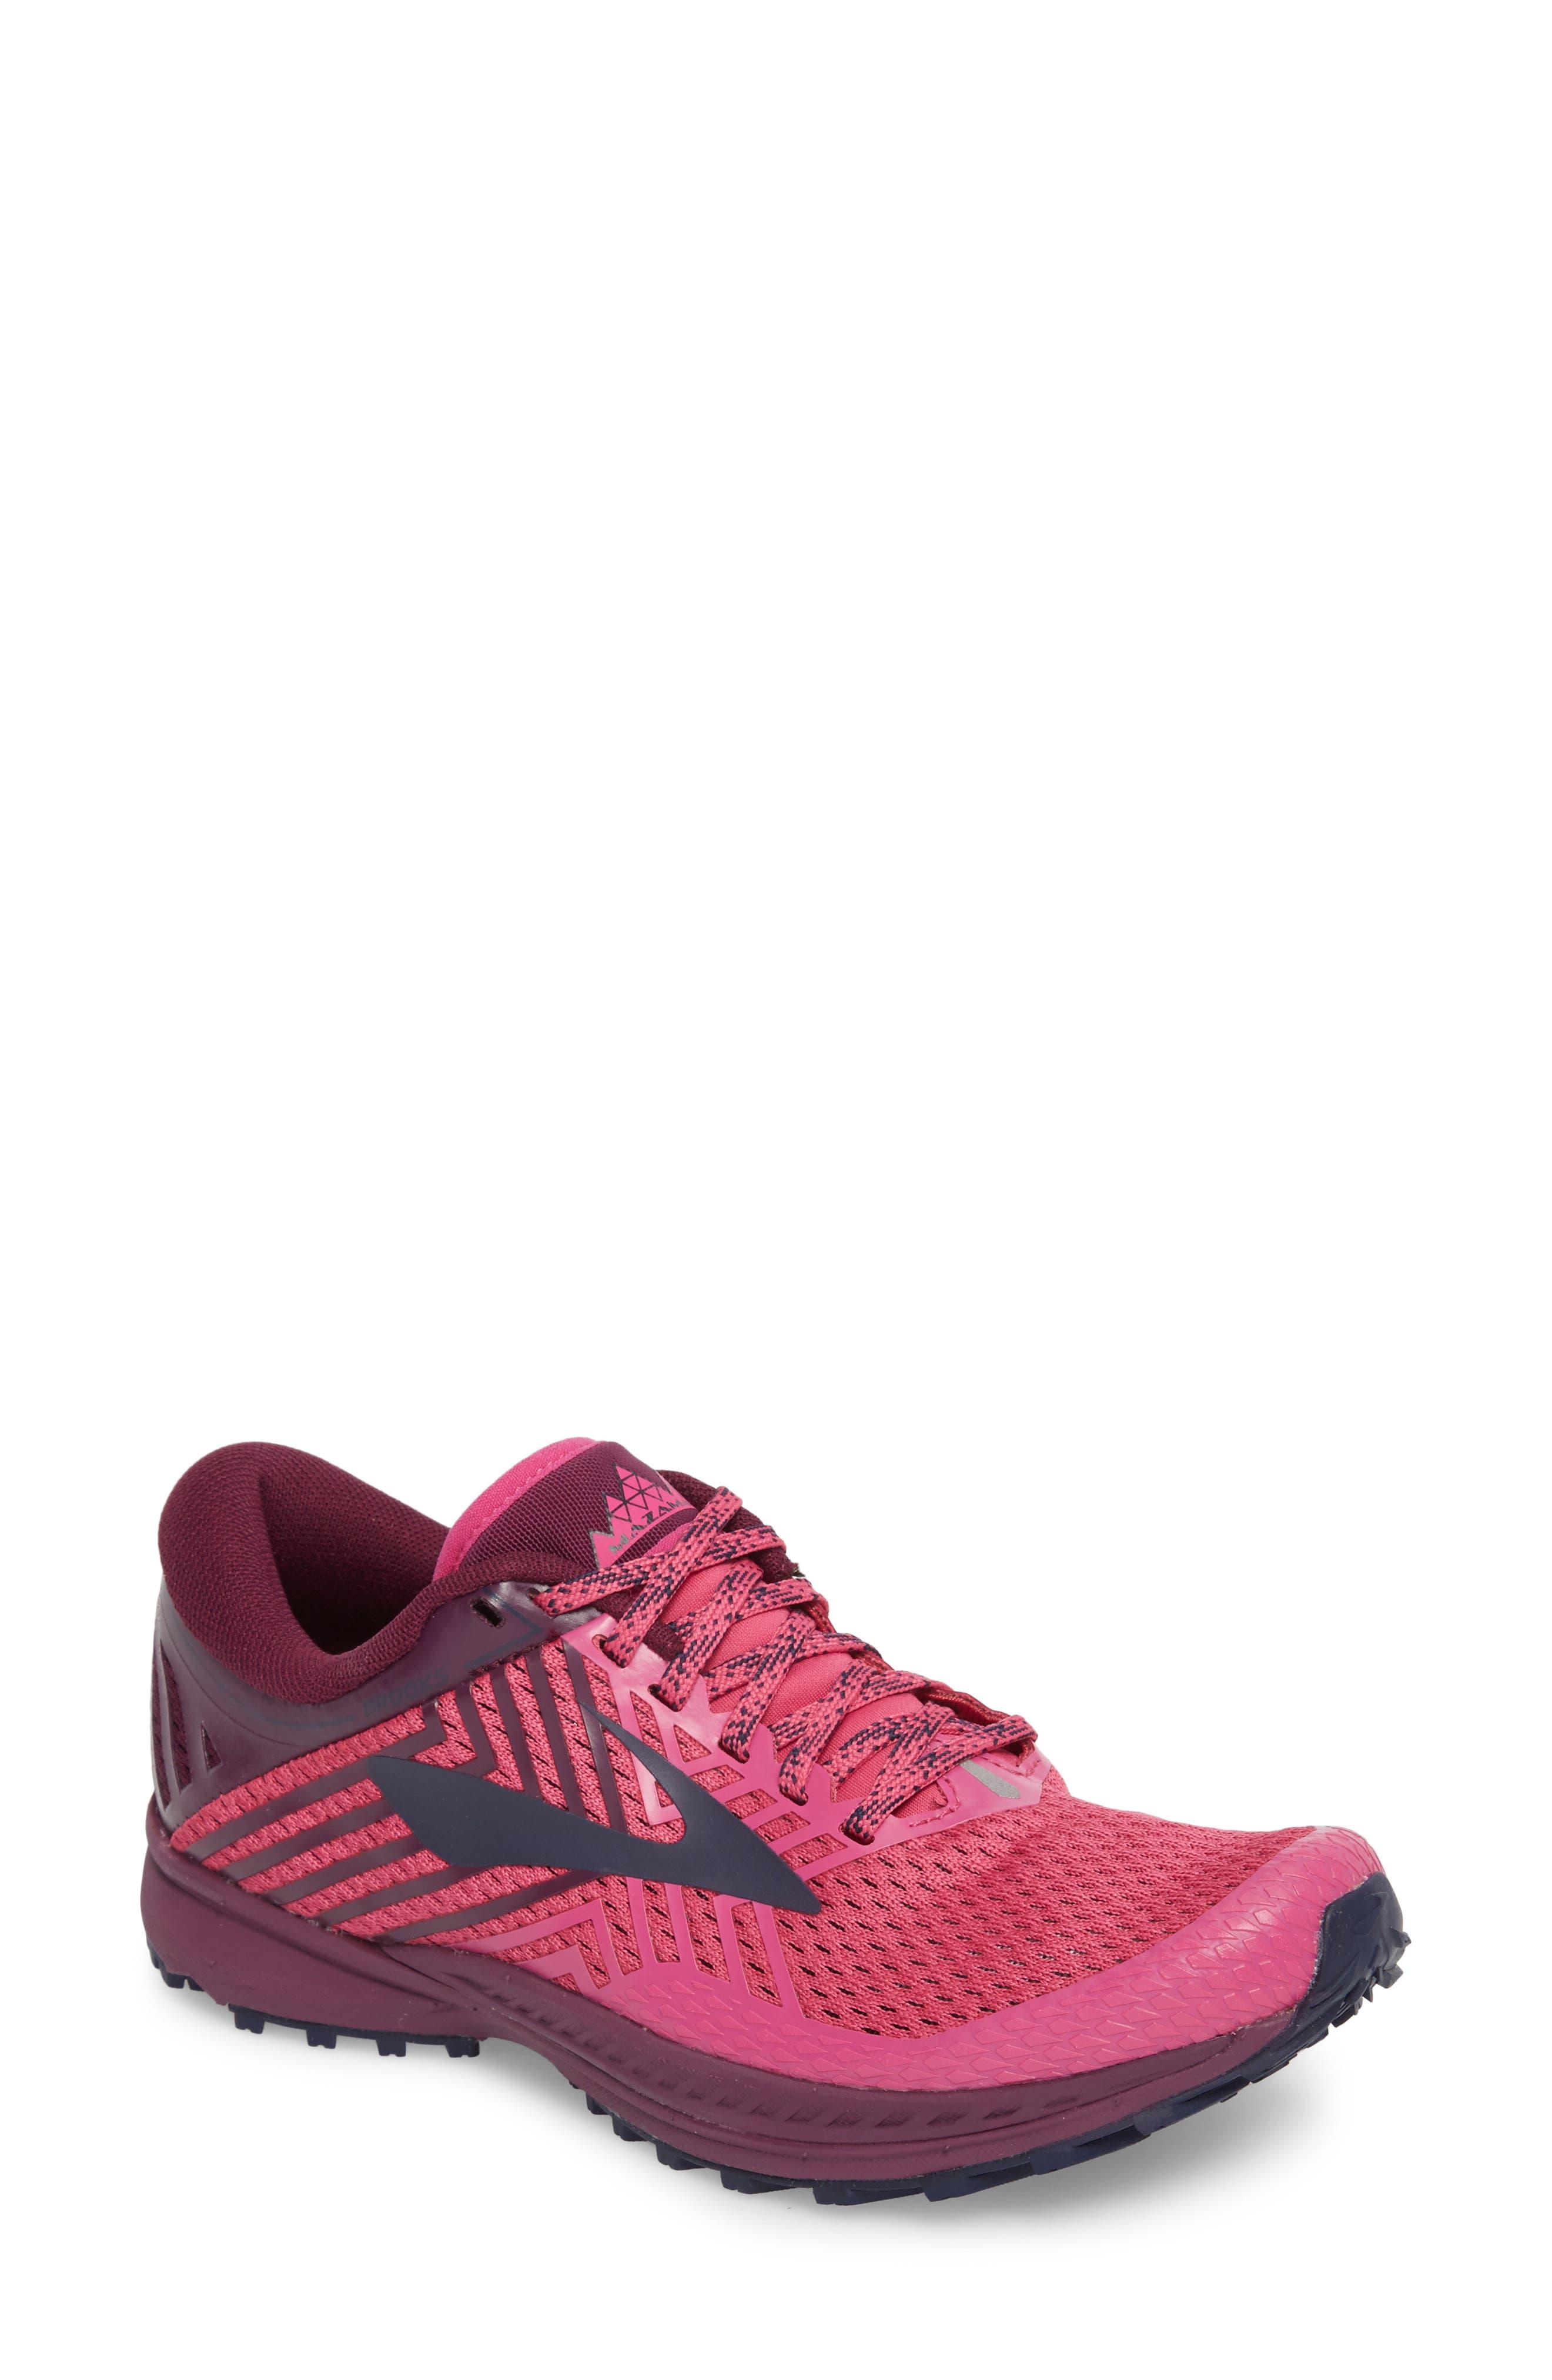 Mazama 2 Trail Running Shoe,                         Main,                         color, PINK/ PLUM/ NAVY